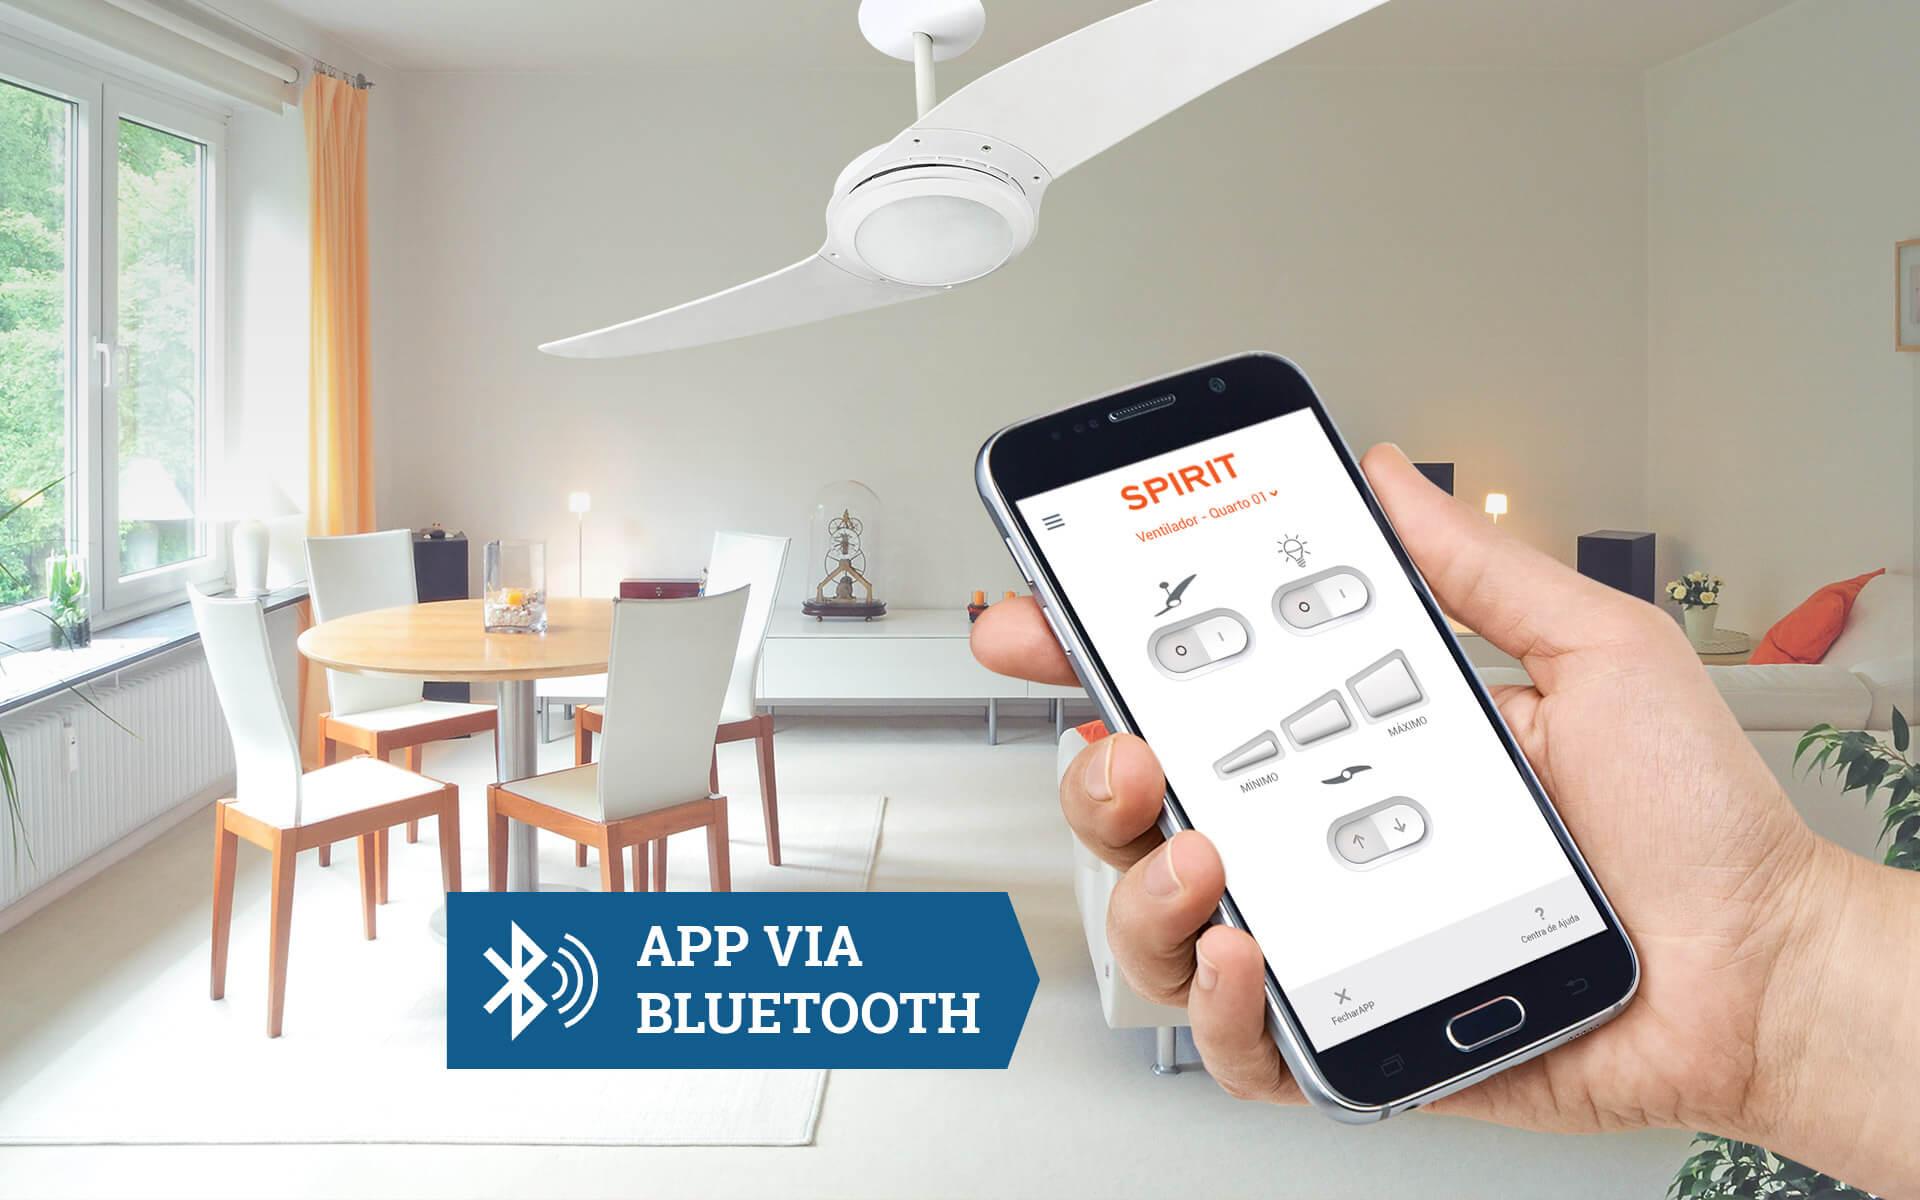 Ventilador de teto controlado por smartphone